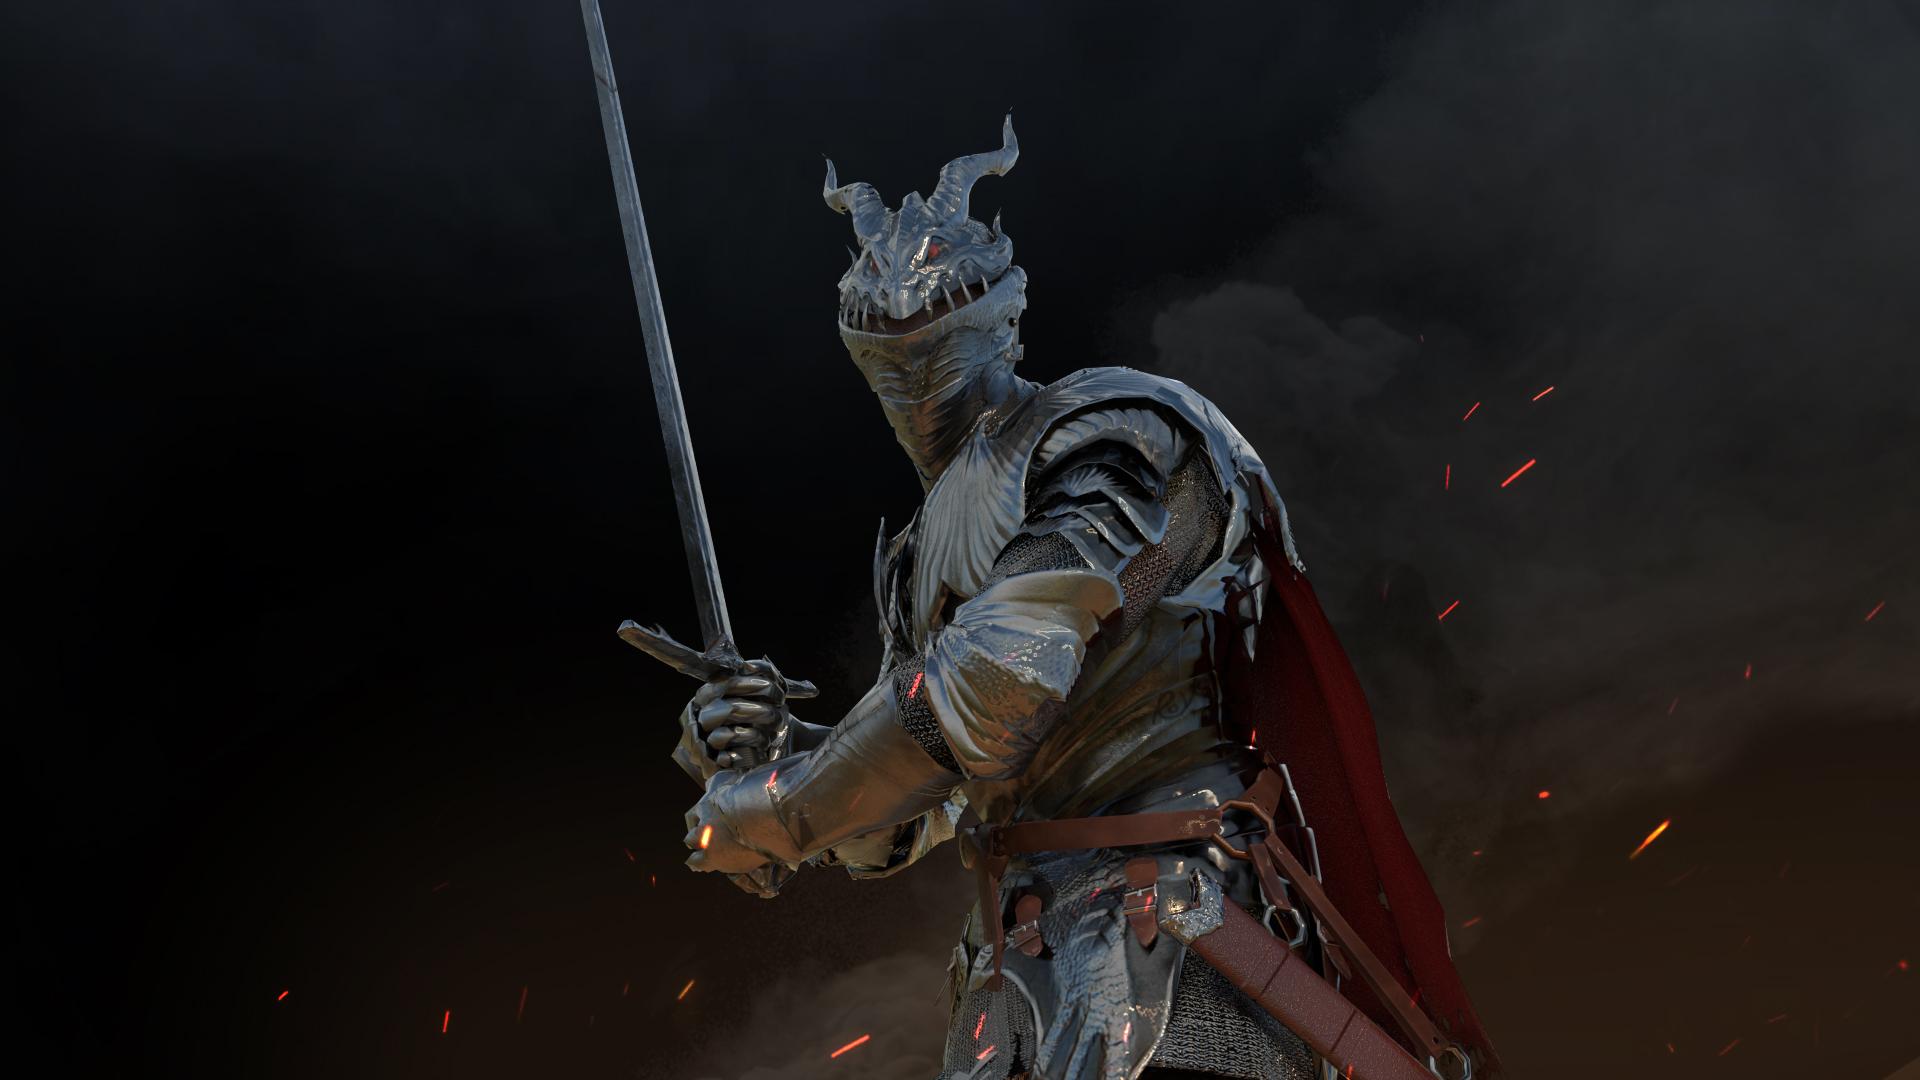 Knight_Dramatic_Roy